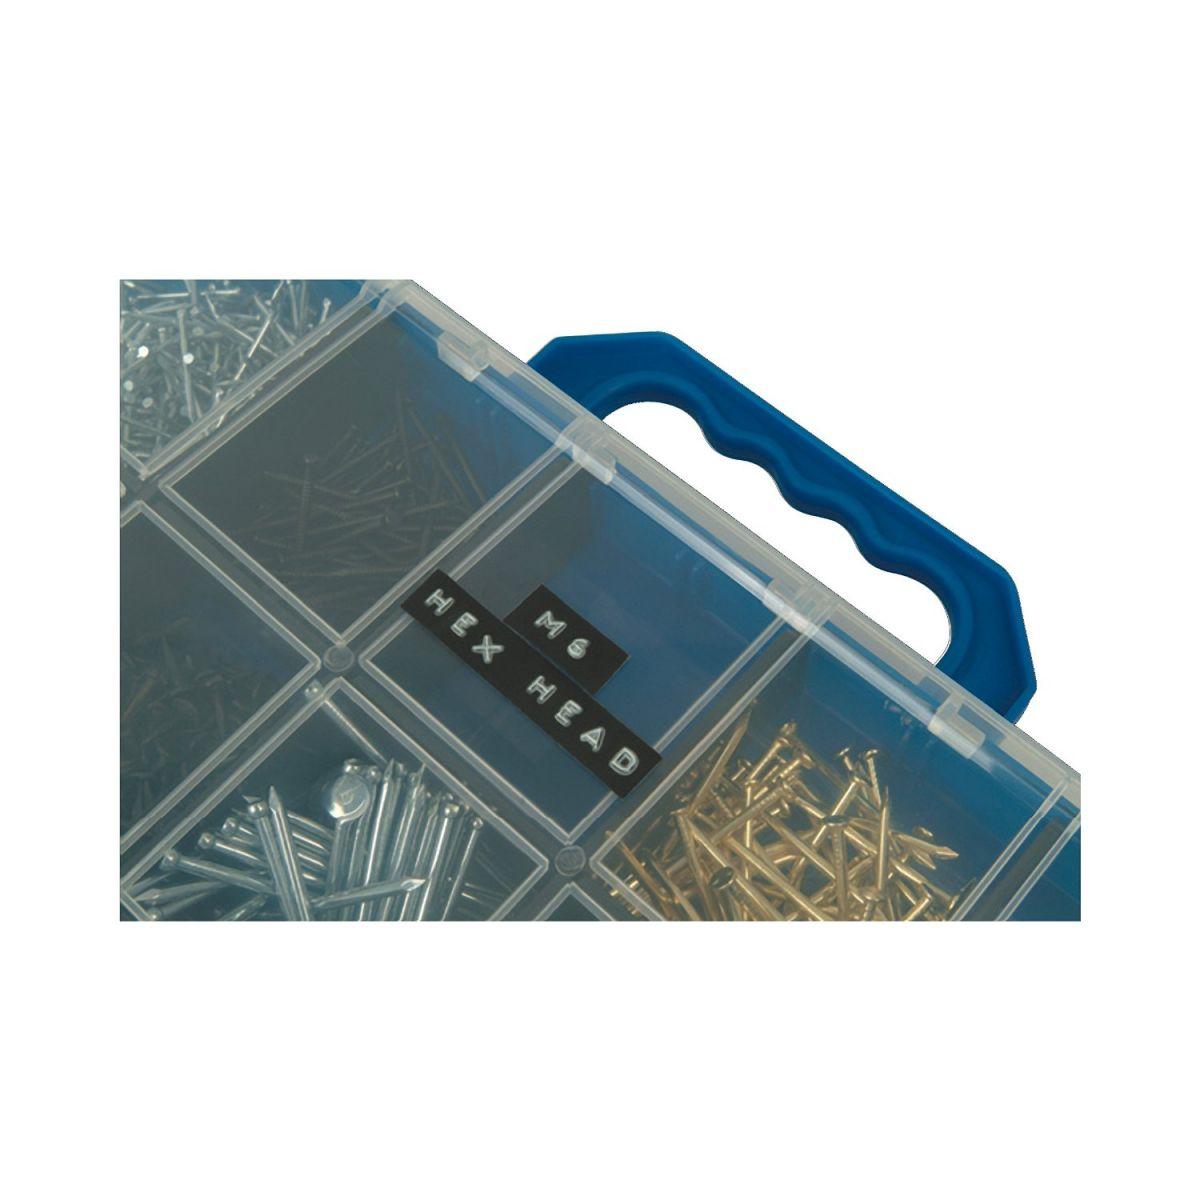 Fita  Vinilica p/ Rotulador Manual 9mmx3m blister c/3un Sortidas 1741671 Dymo